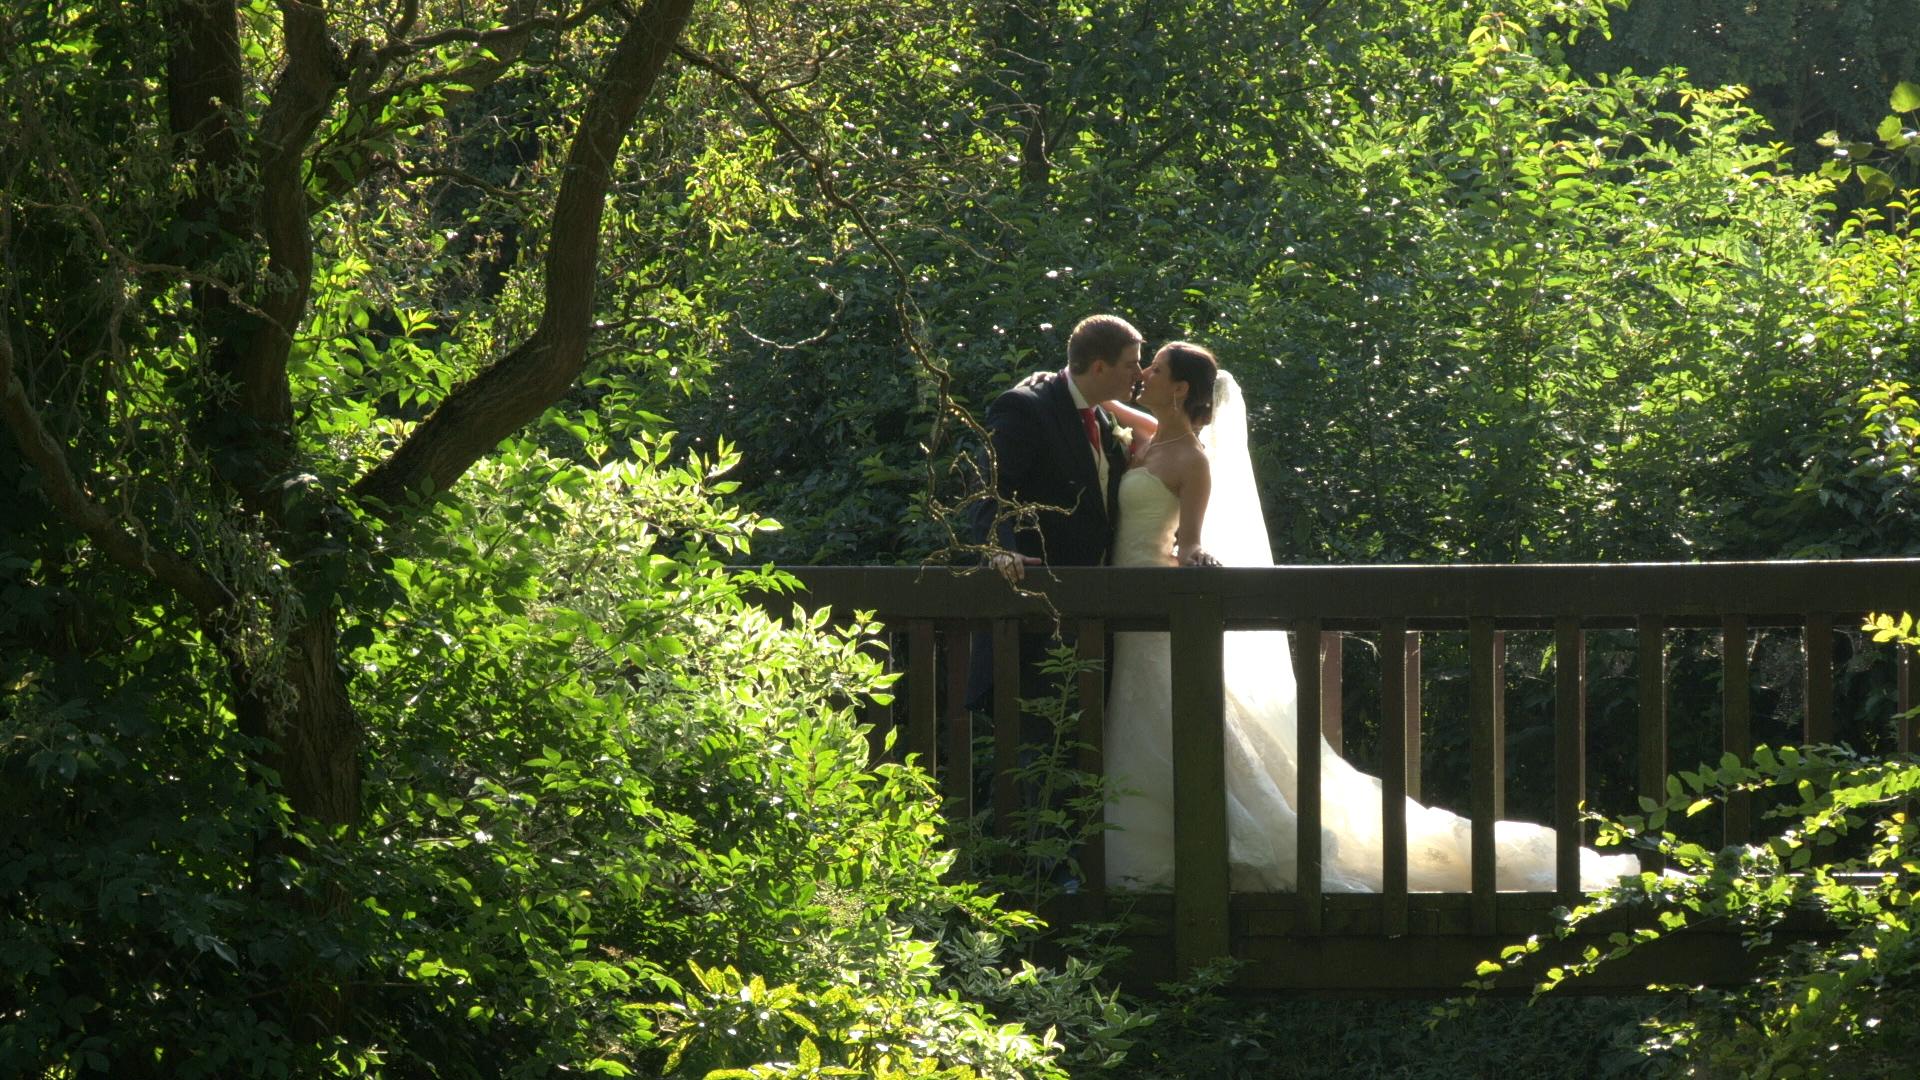 Washington Square Films - Vidéo reportage en Belgique - Wedding films in Belgium